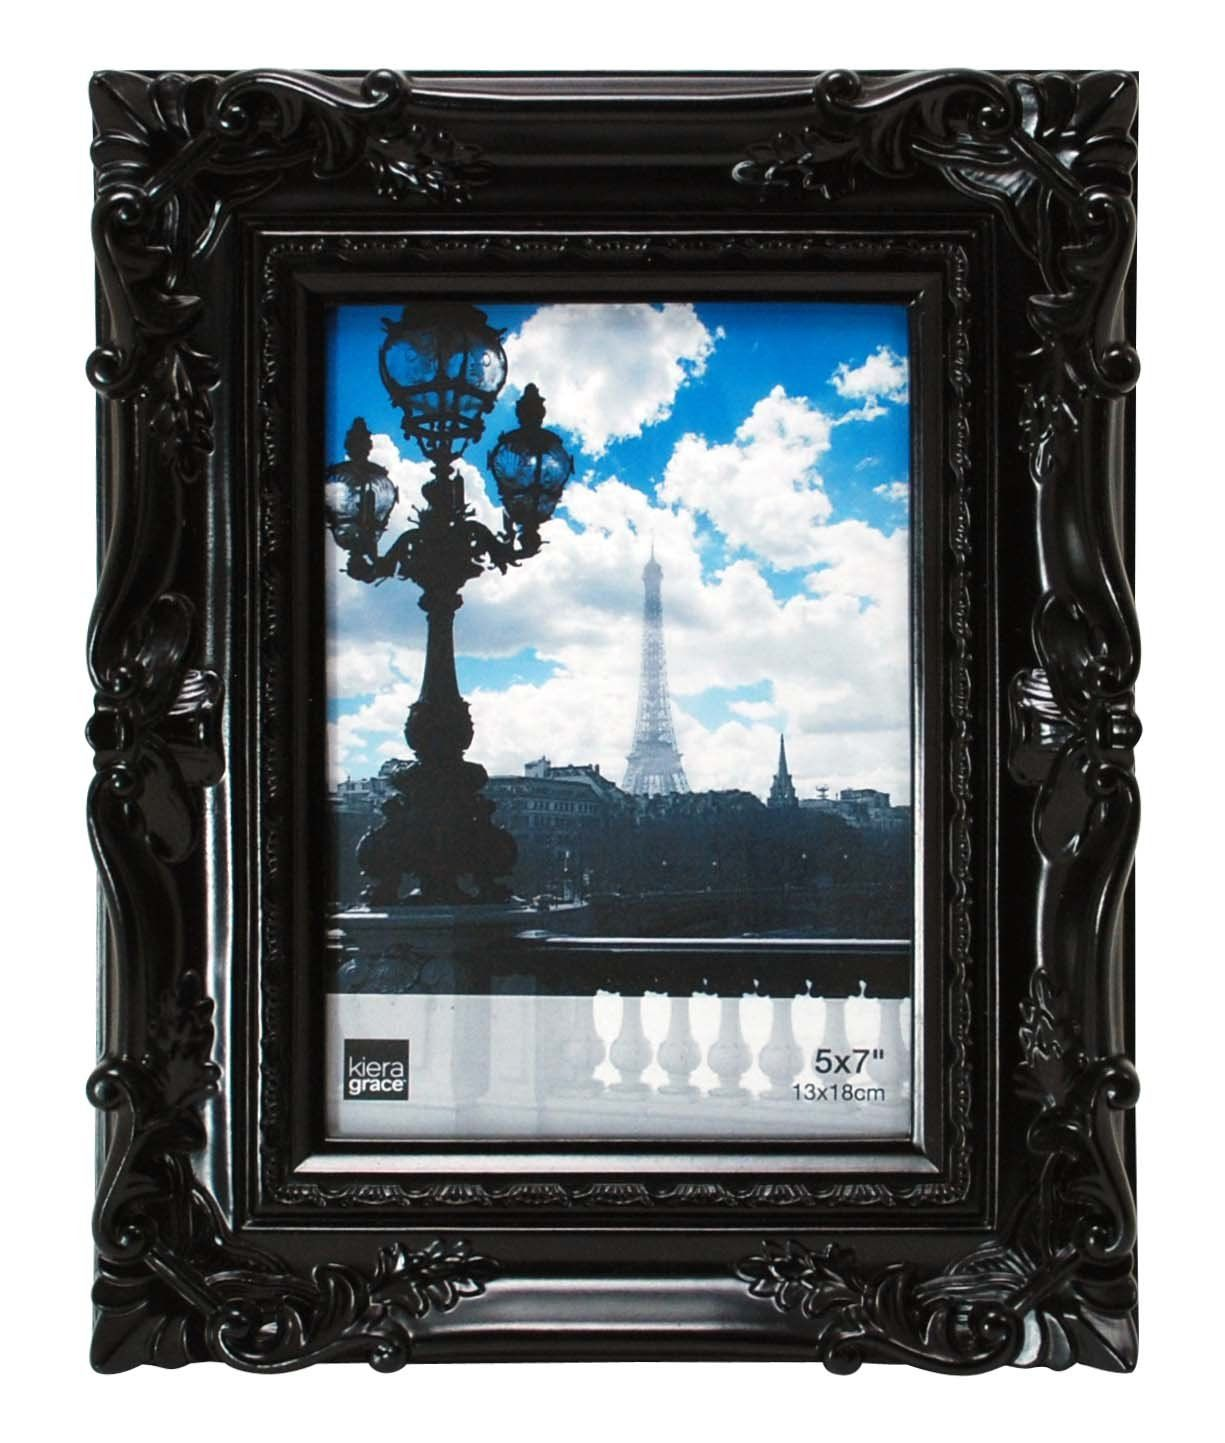 Amazon.com - Kiera Grace Virginia Ornate Photo Frame, 5 by 7-Inch ...